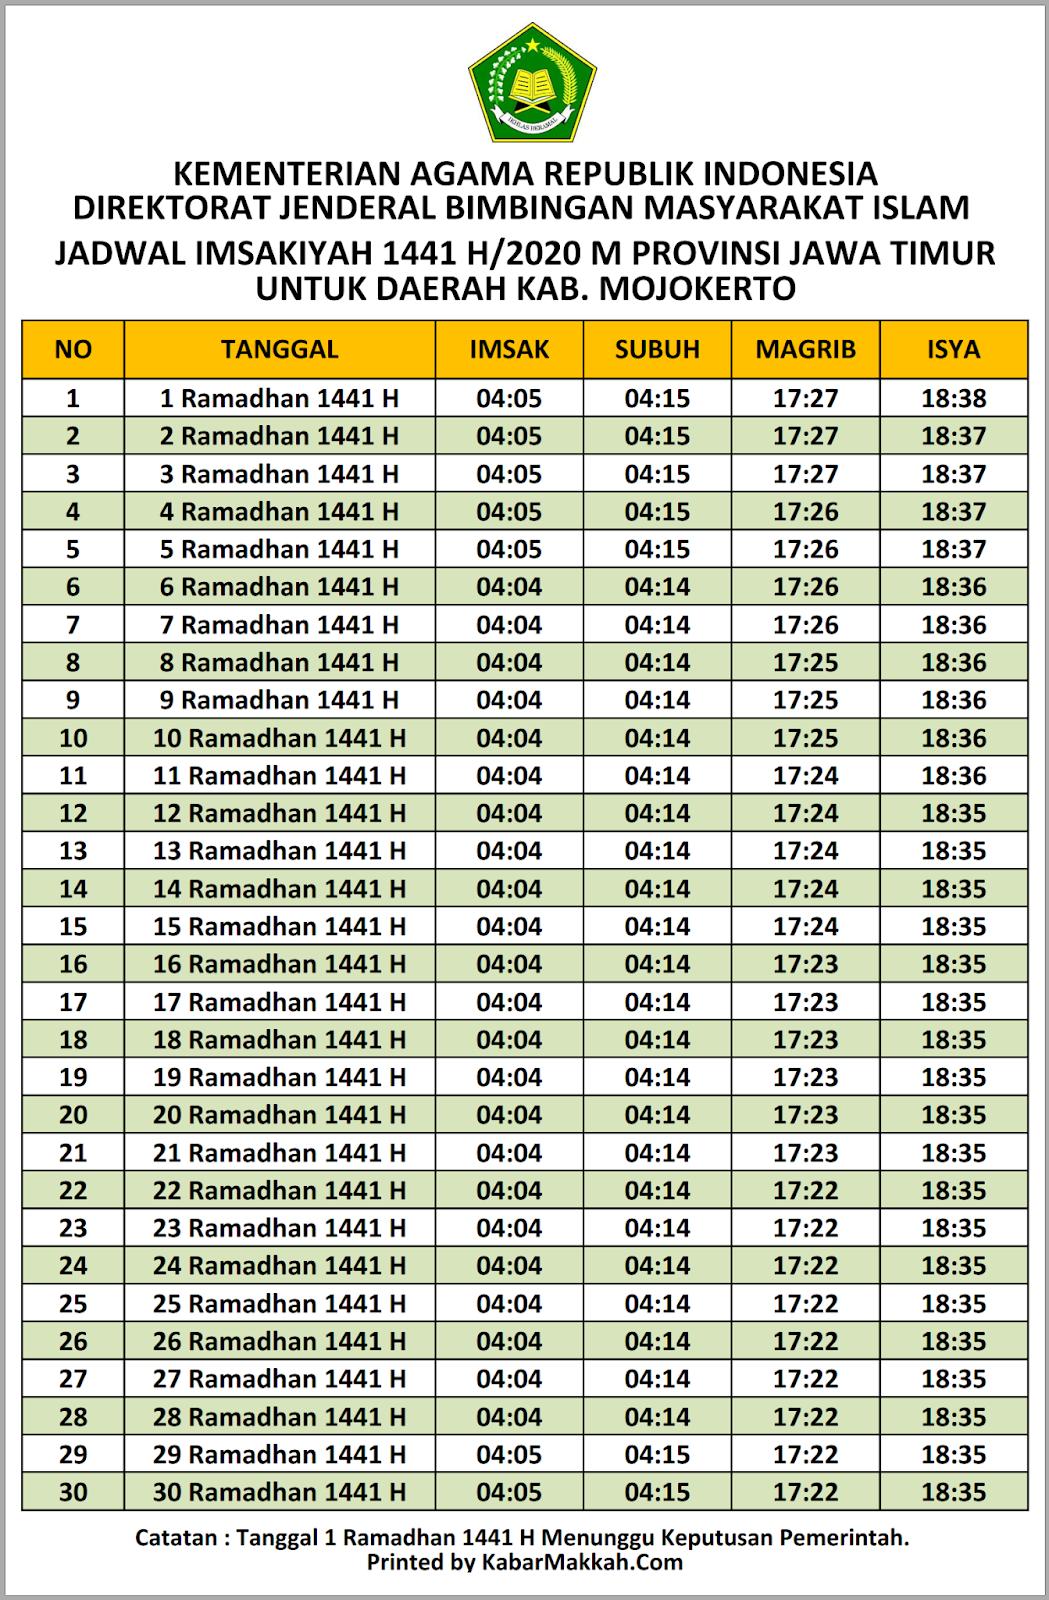 Jadwal Imsakiyah Mojokerto 2020